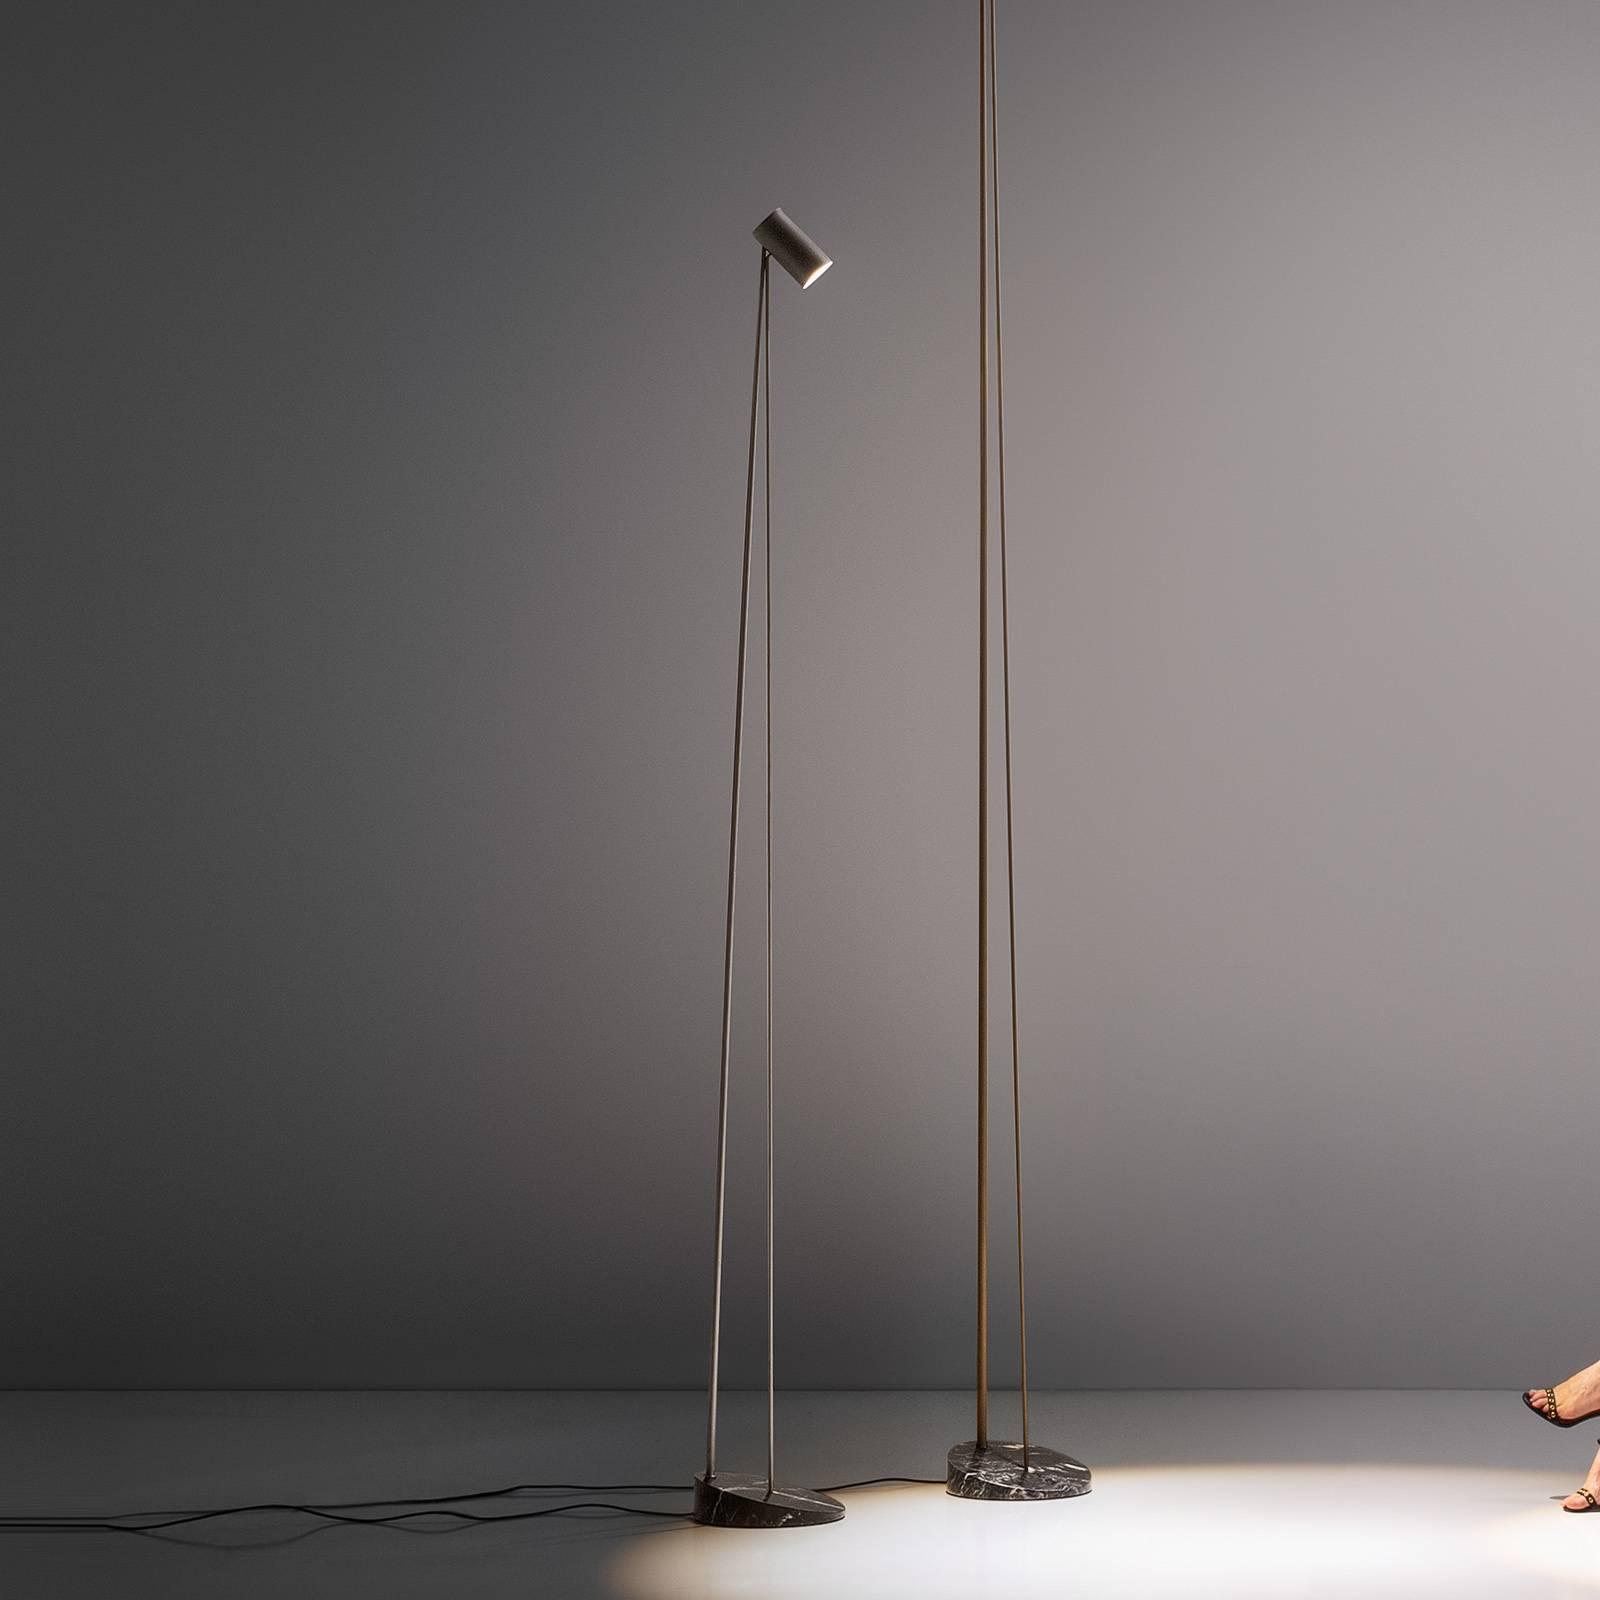 OLEV Boom lampadaire LED 240cm IP20 bruni